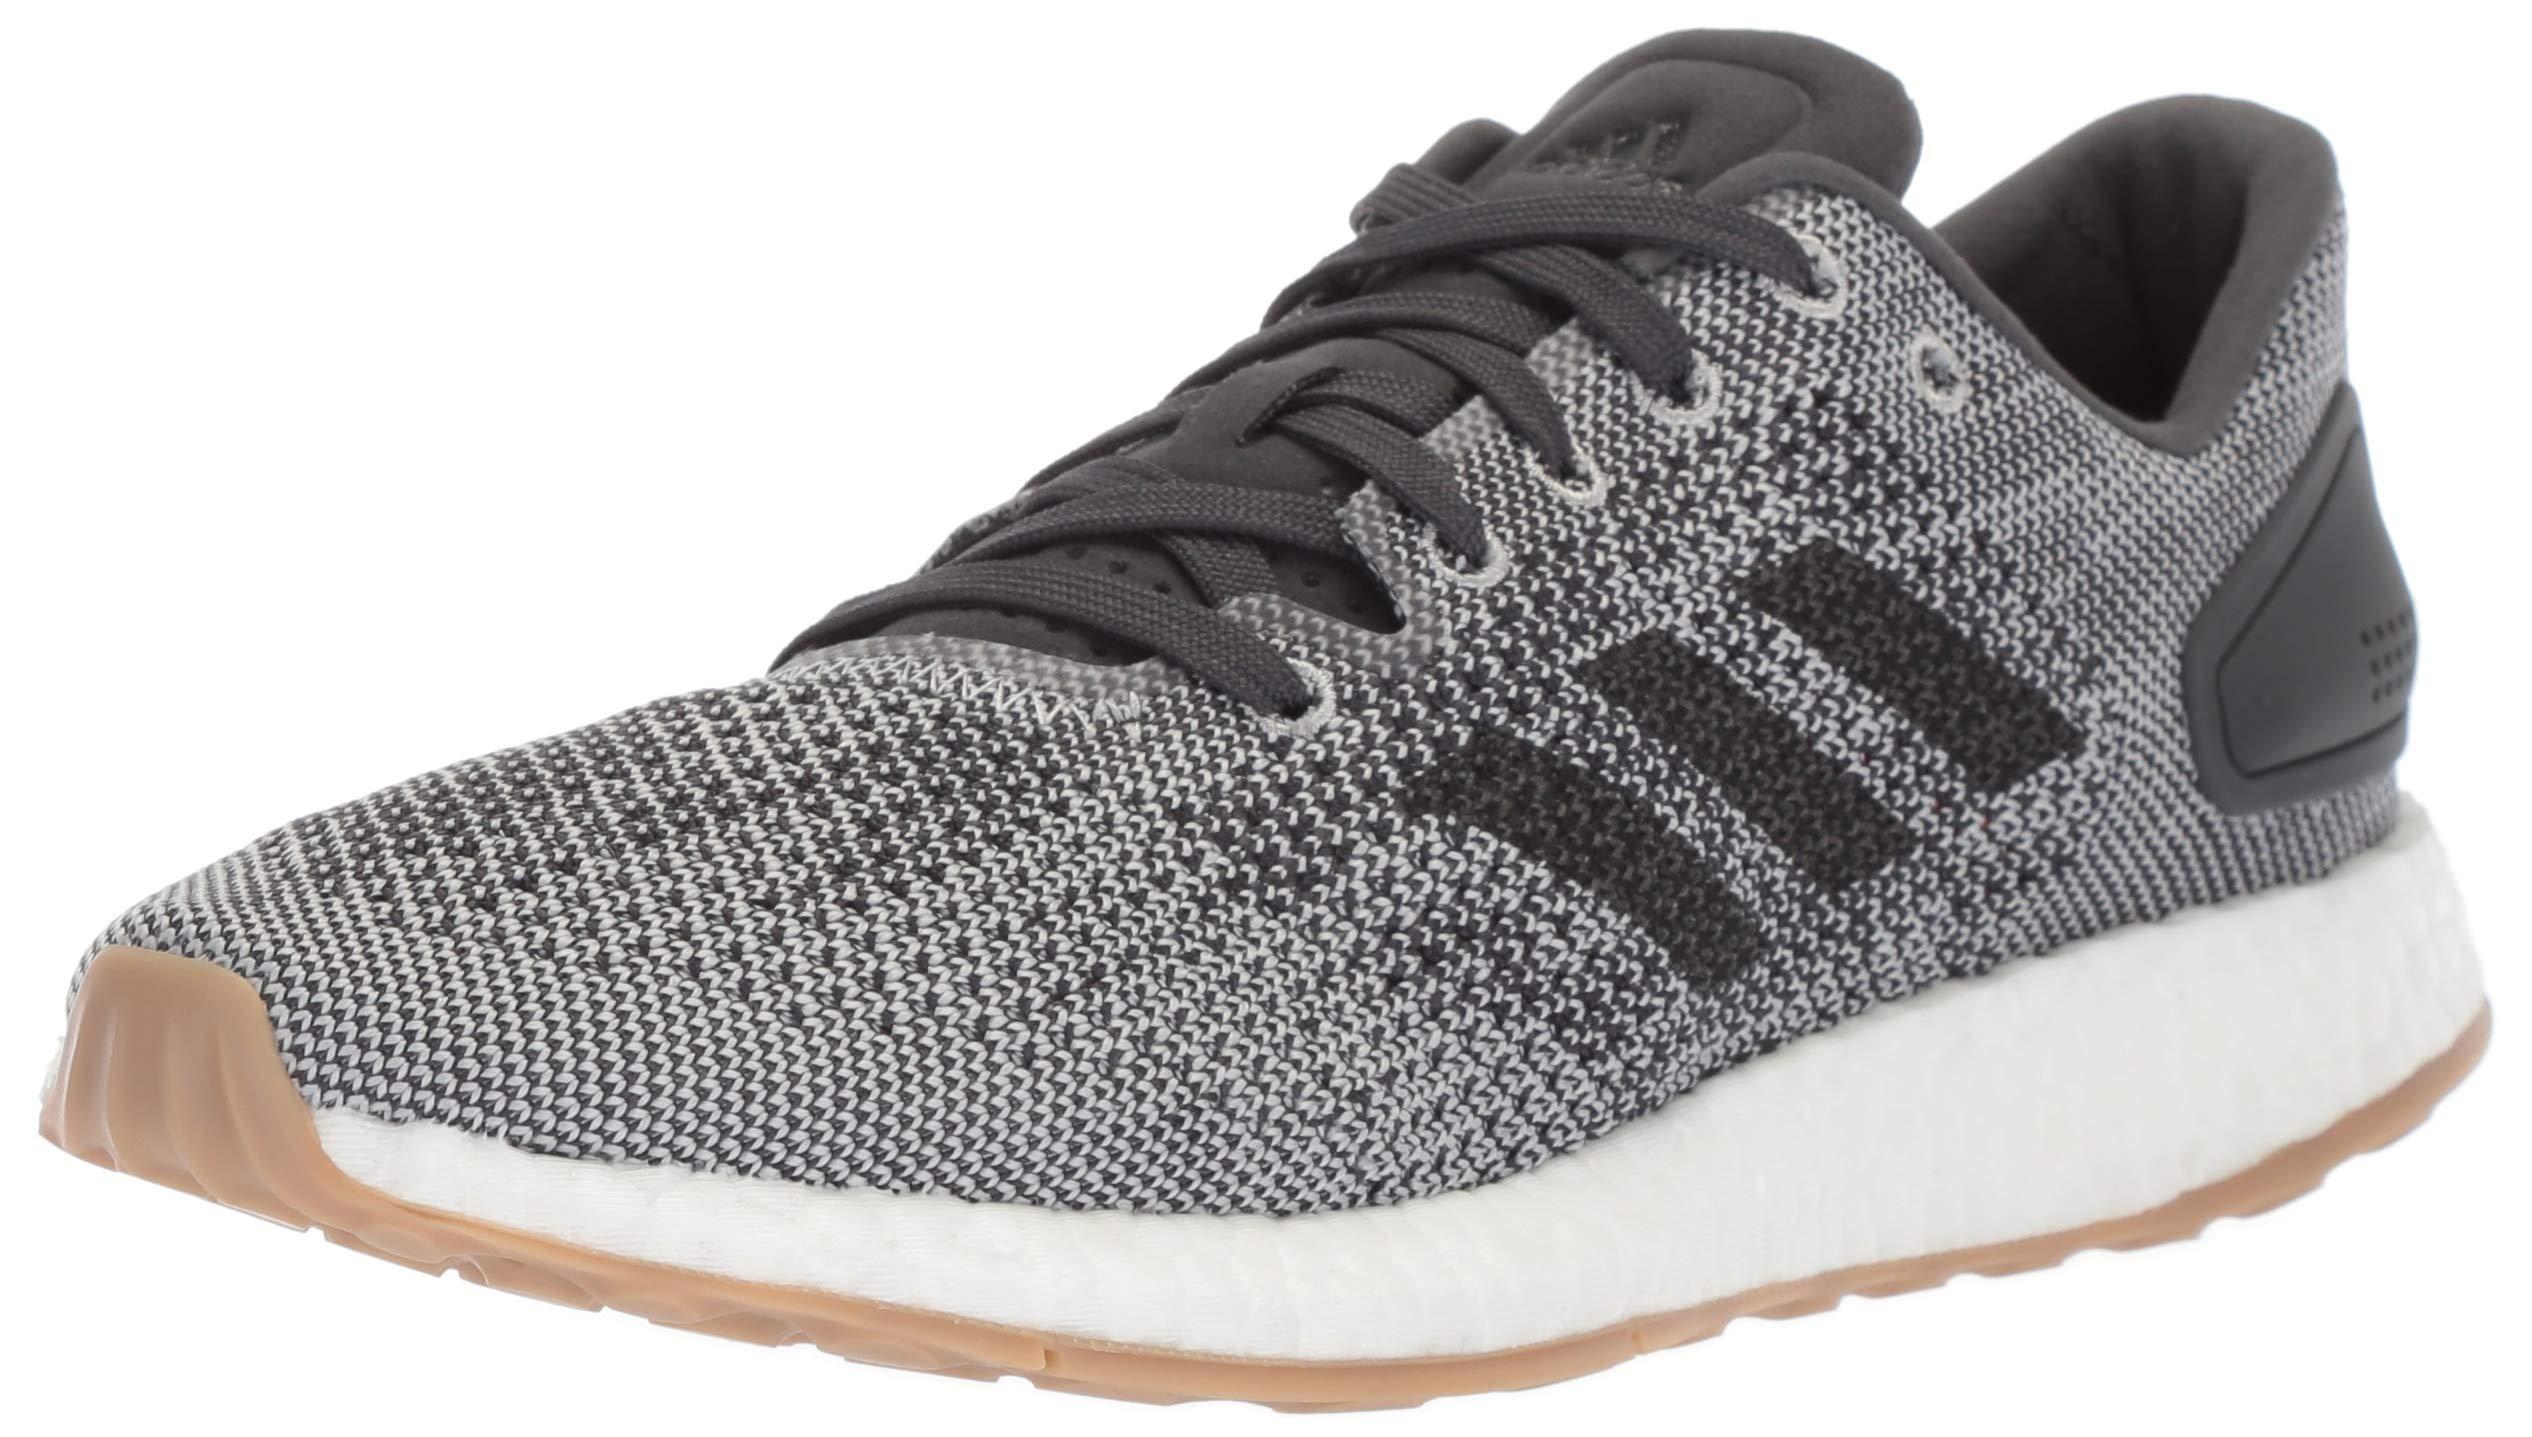 Dpr Men's Pureboost Adidas Running Galleon ShoeCarbonblackgrey yb7IgvfY6